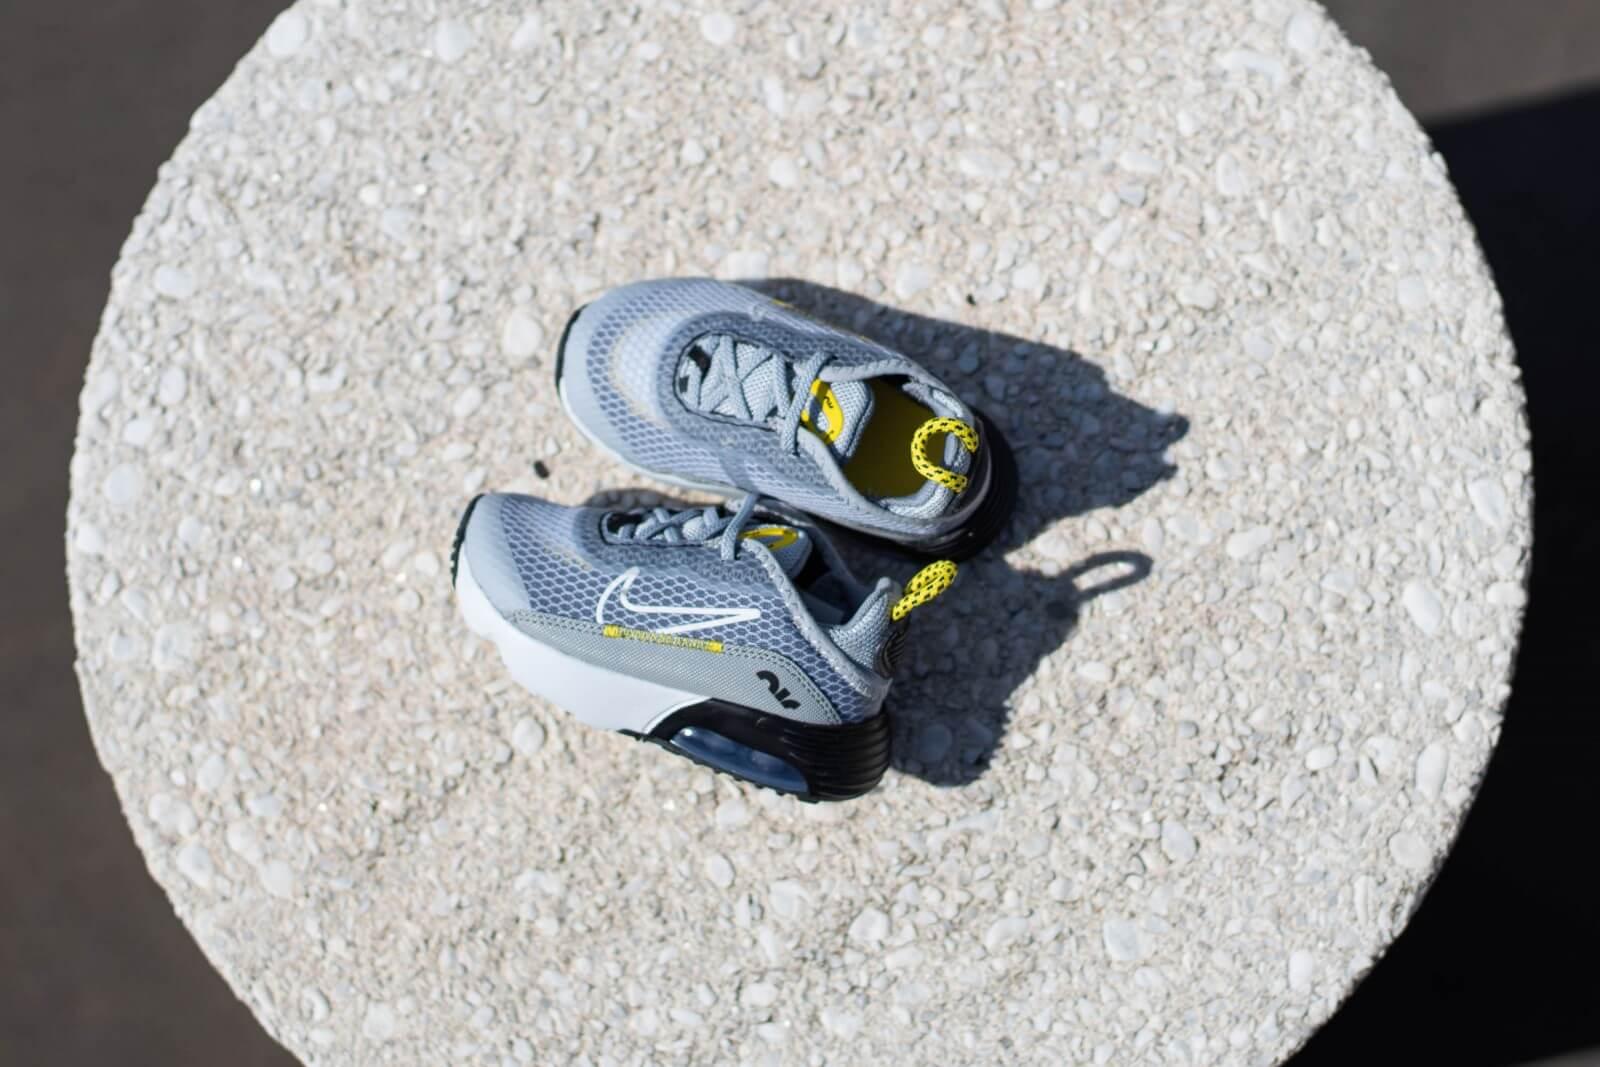 Nike Air Max 2090 TD Wolf GreyWhite Particle Grey CU2092 002